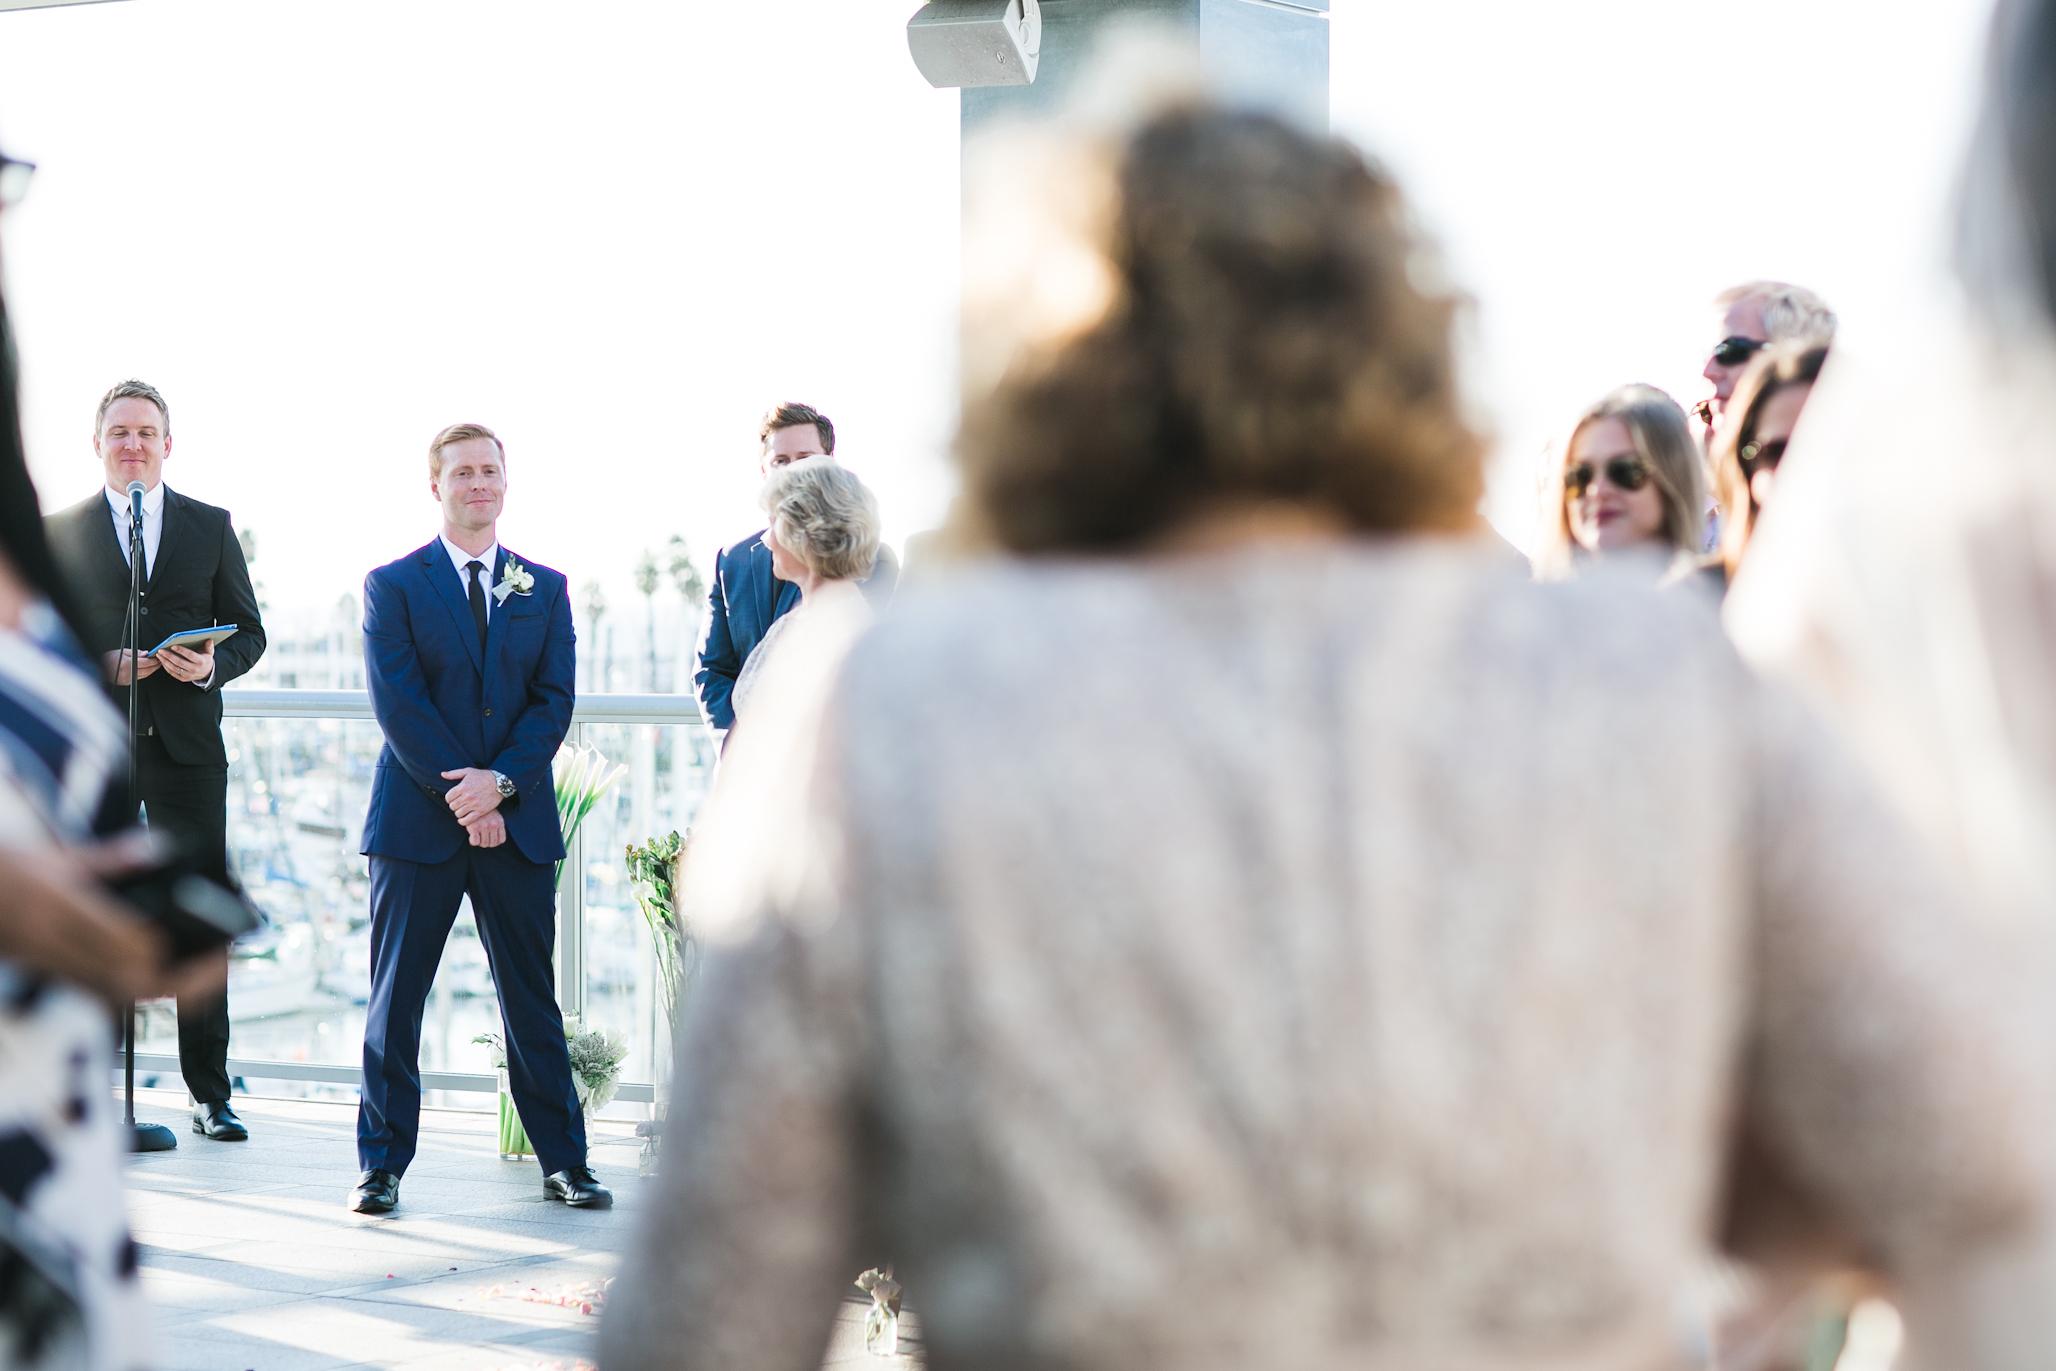 Seeing his bride walk down the aisle.